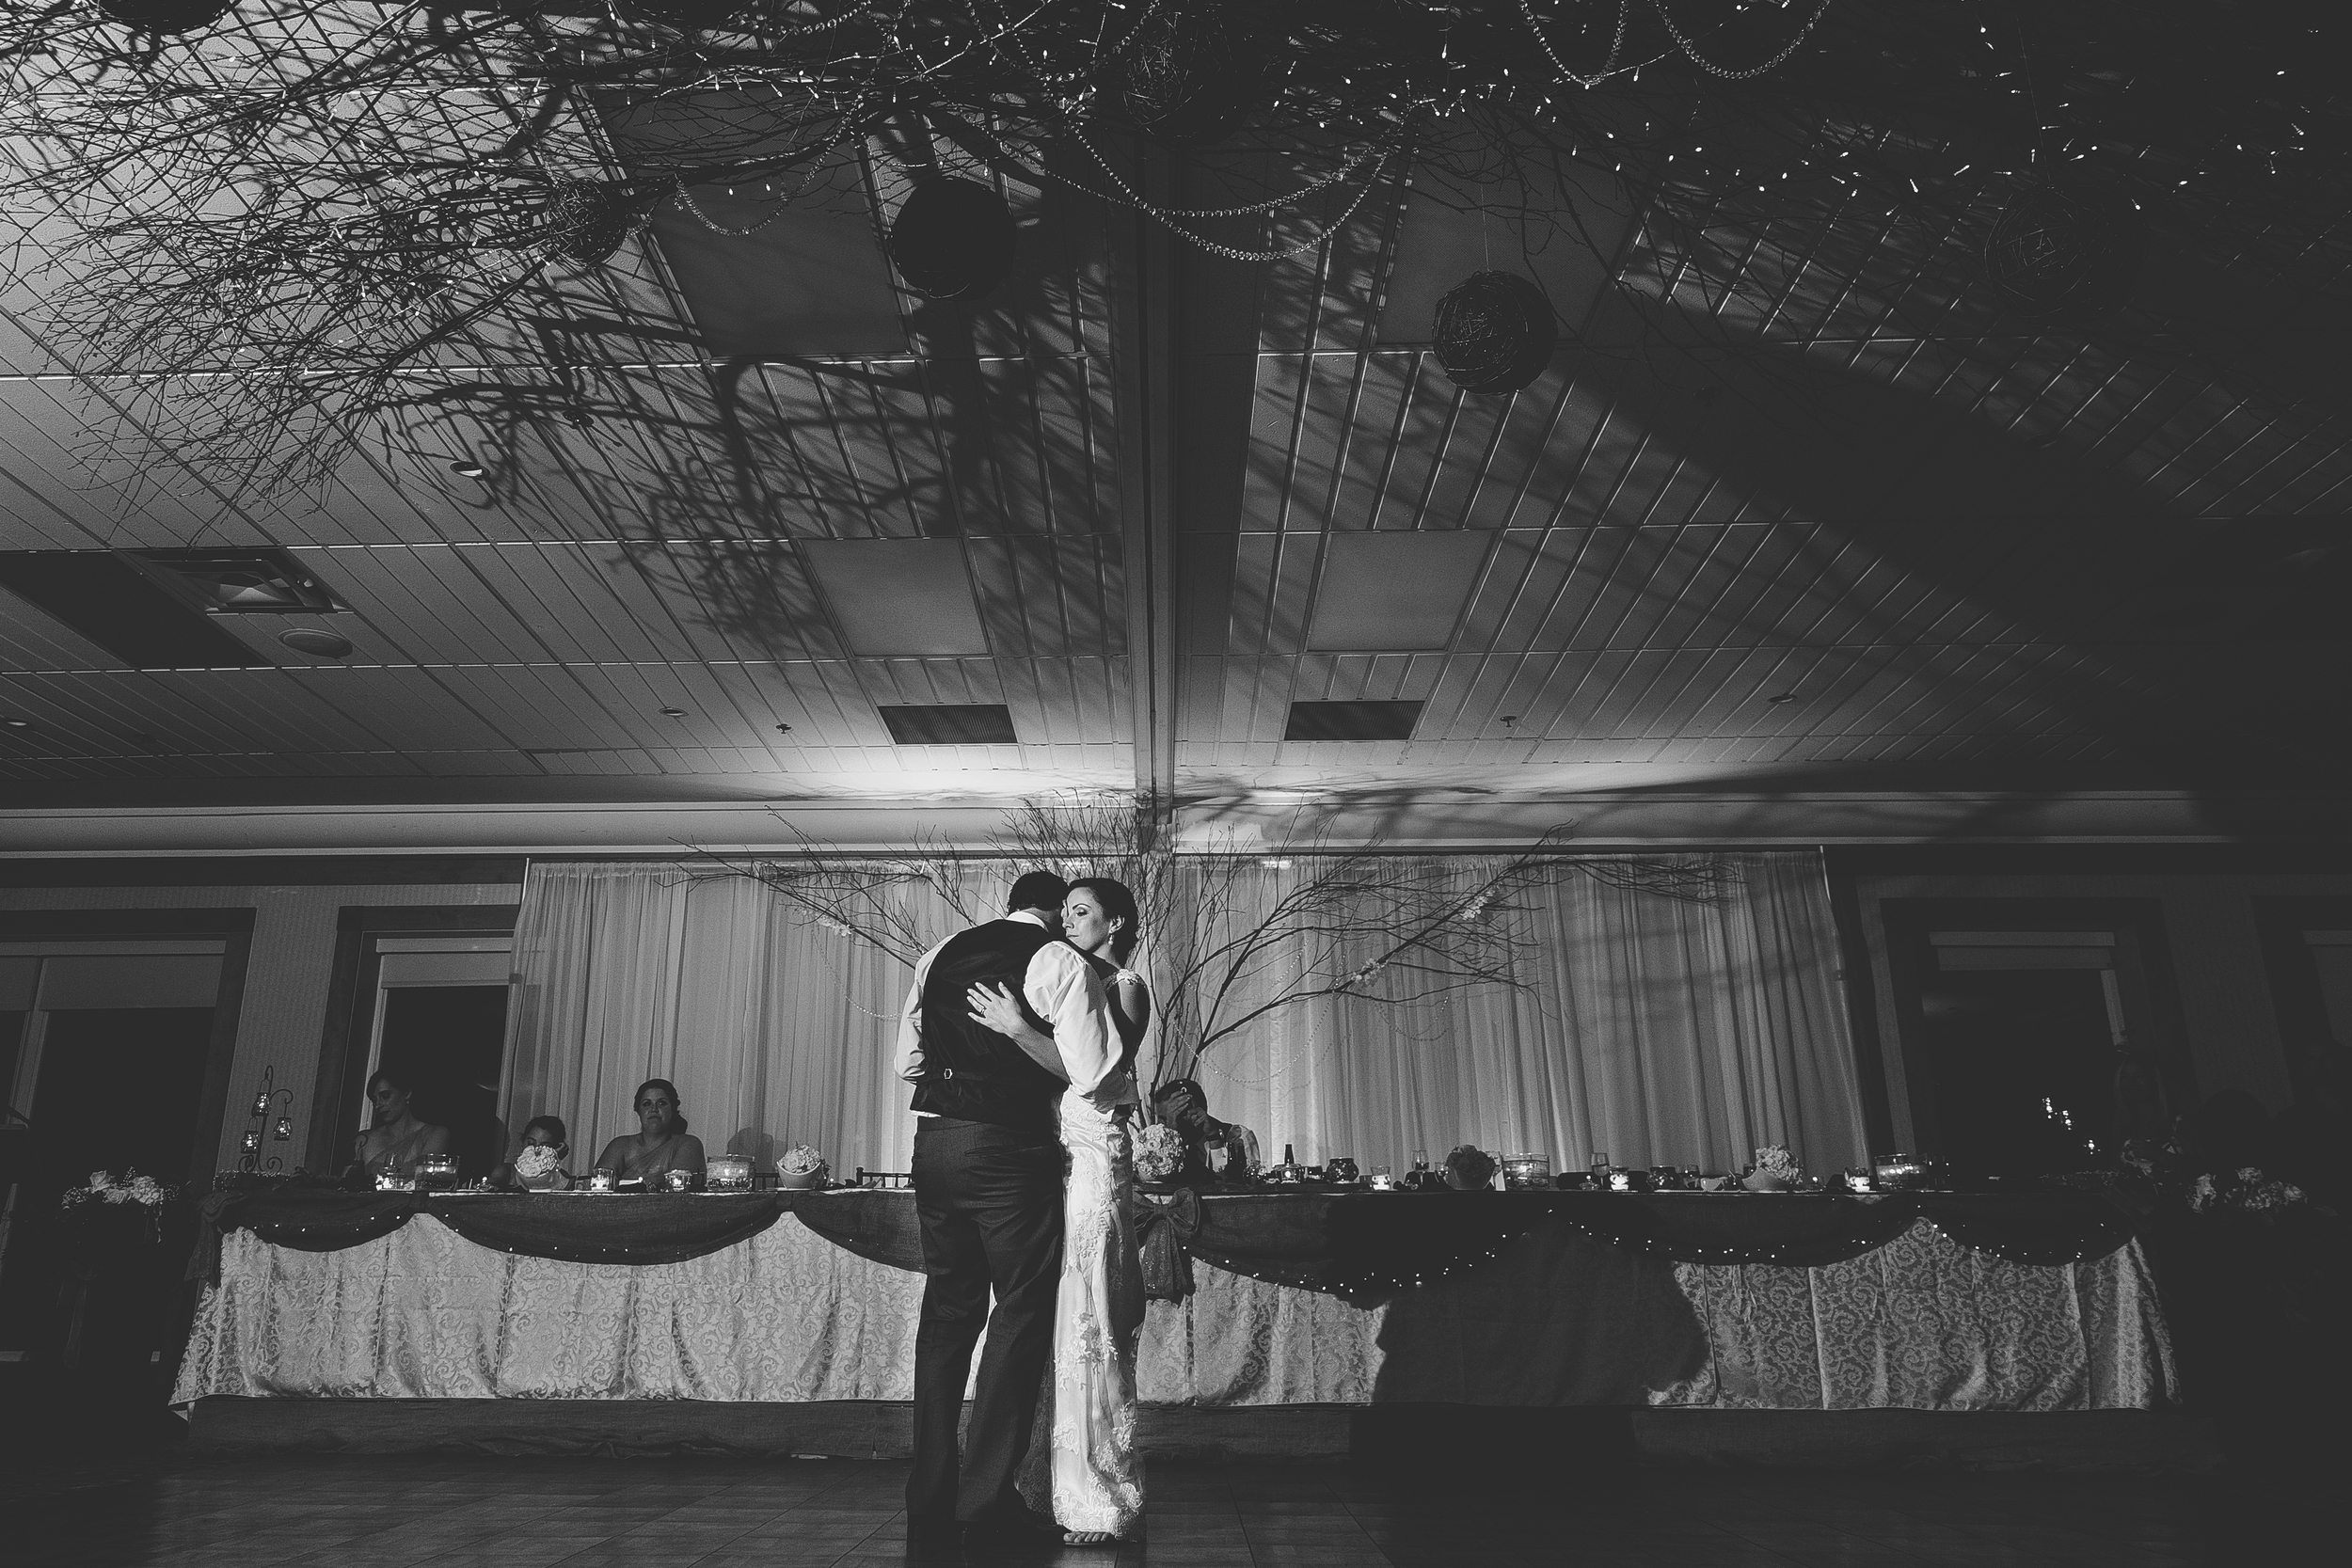 Trish_Mike_Wedding_dance_29Aug15-4-2.jpg